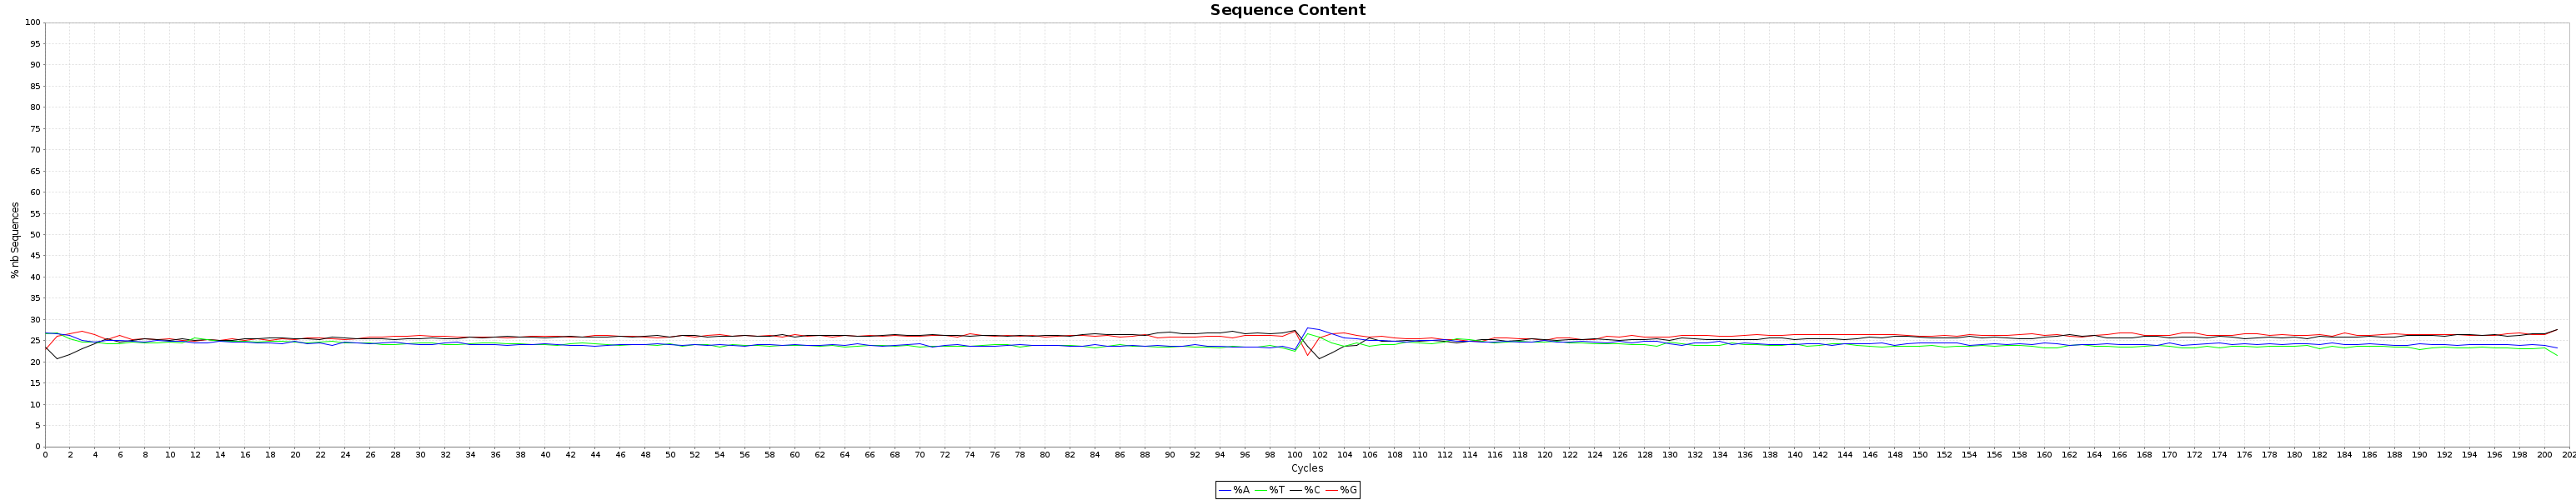 nucleotide_content